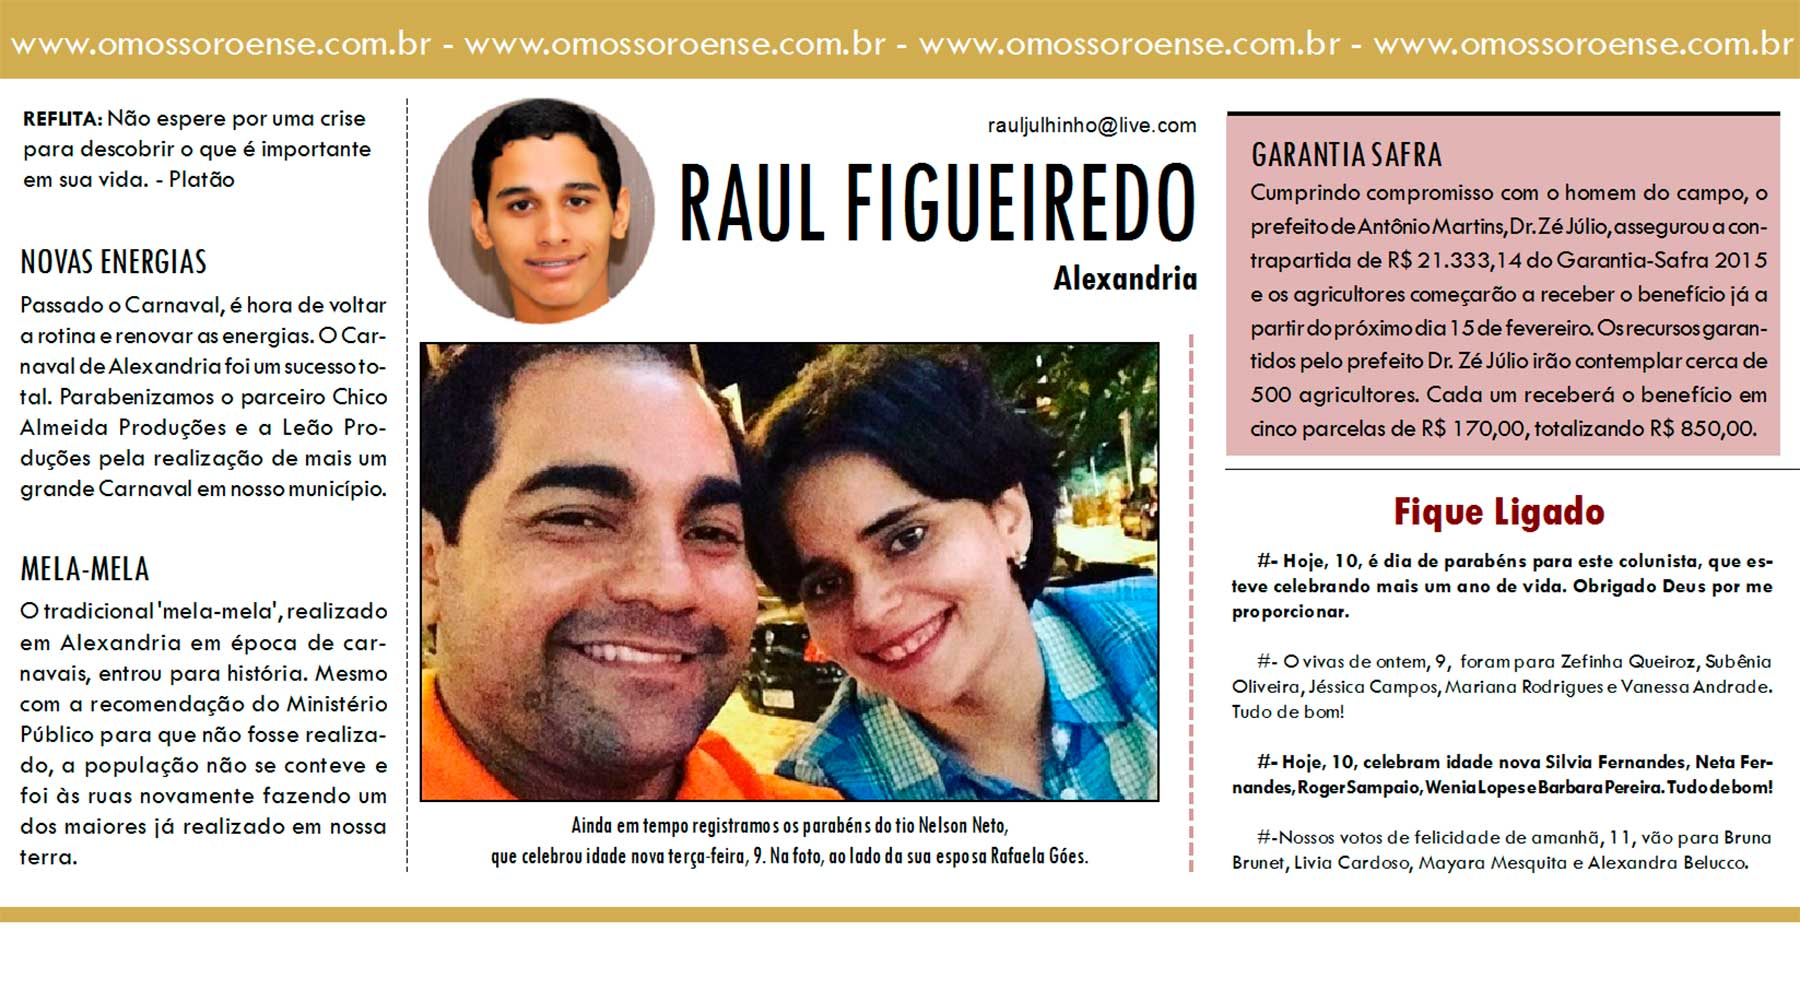 RAUL-FIGUEIREDO---ALEXANDRIA-10-02